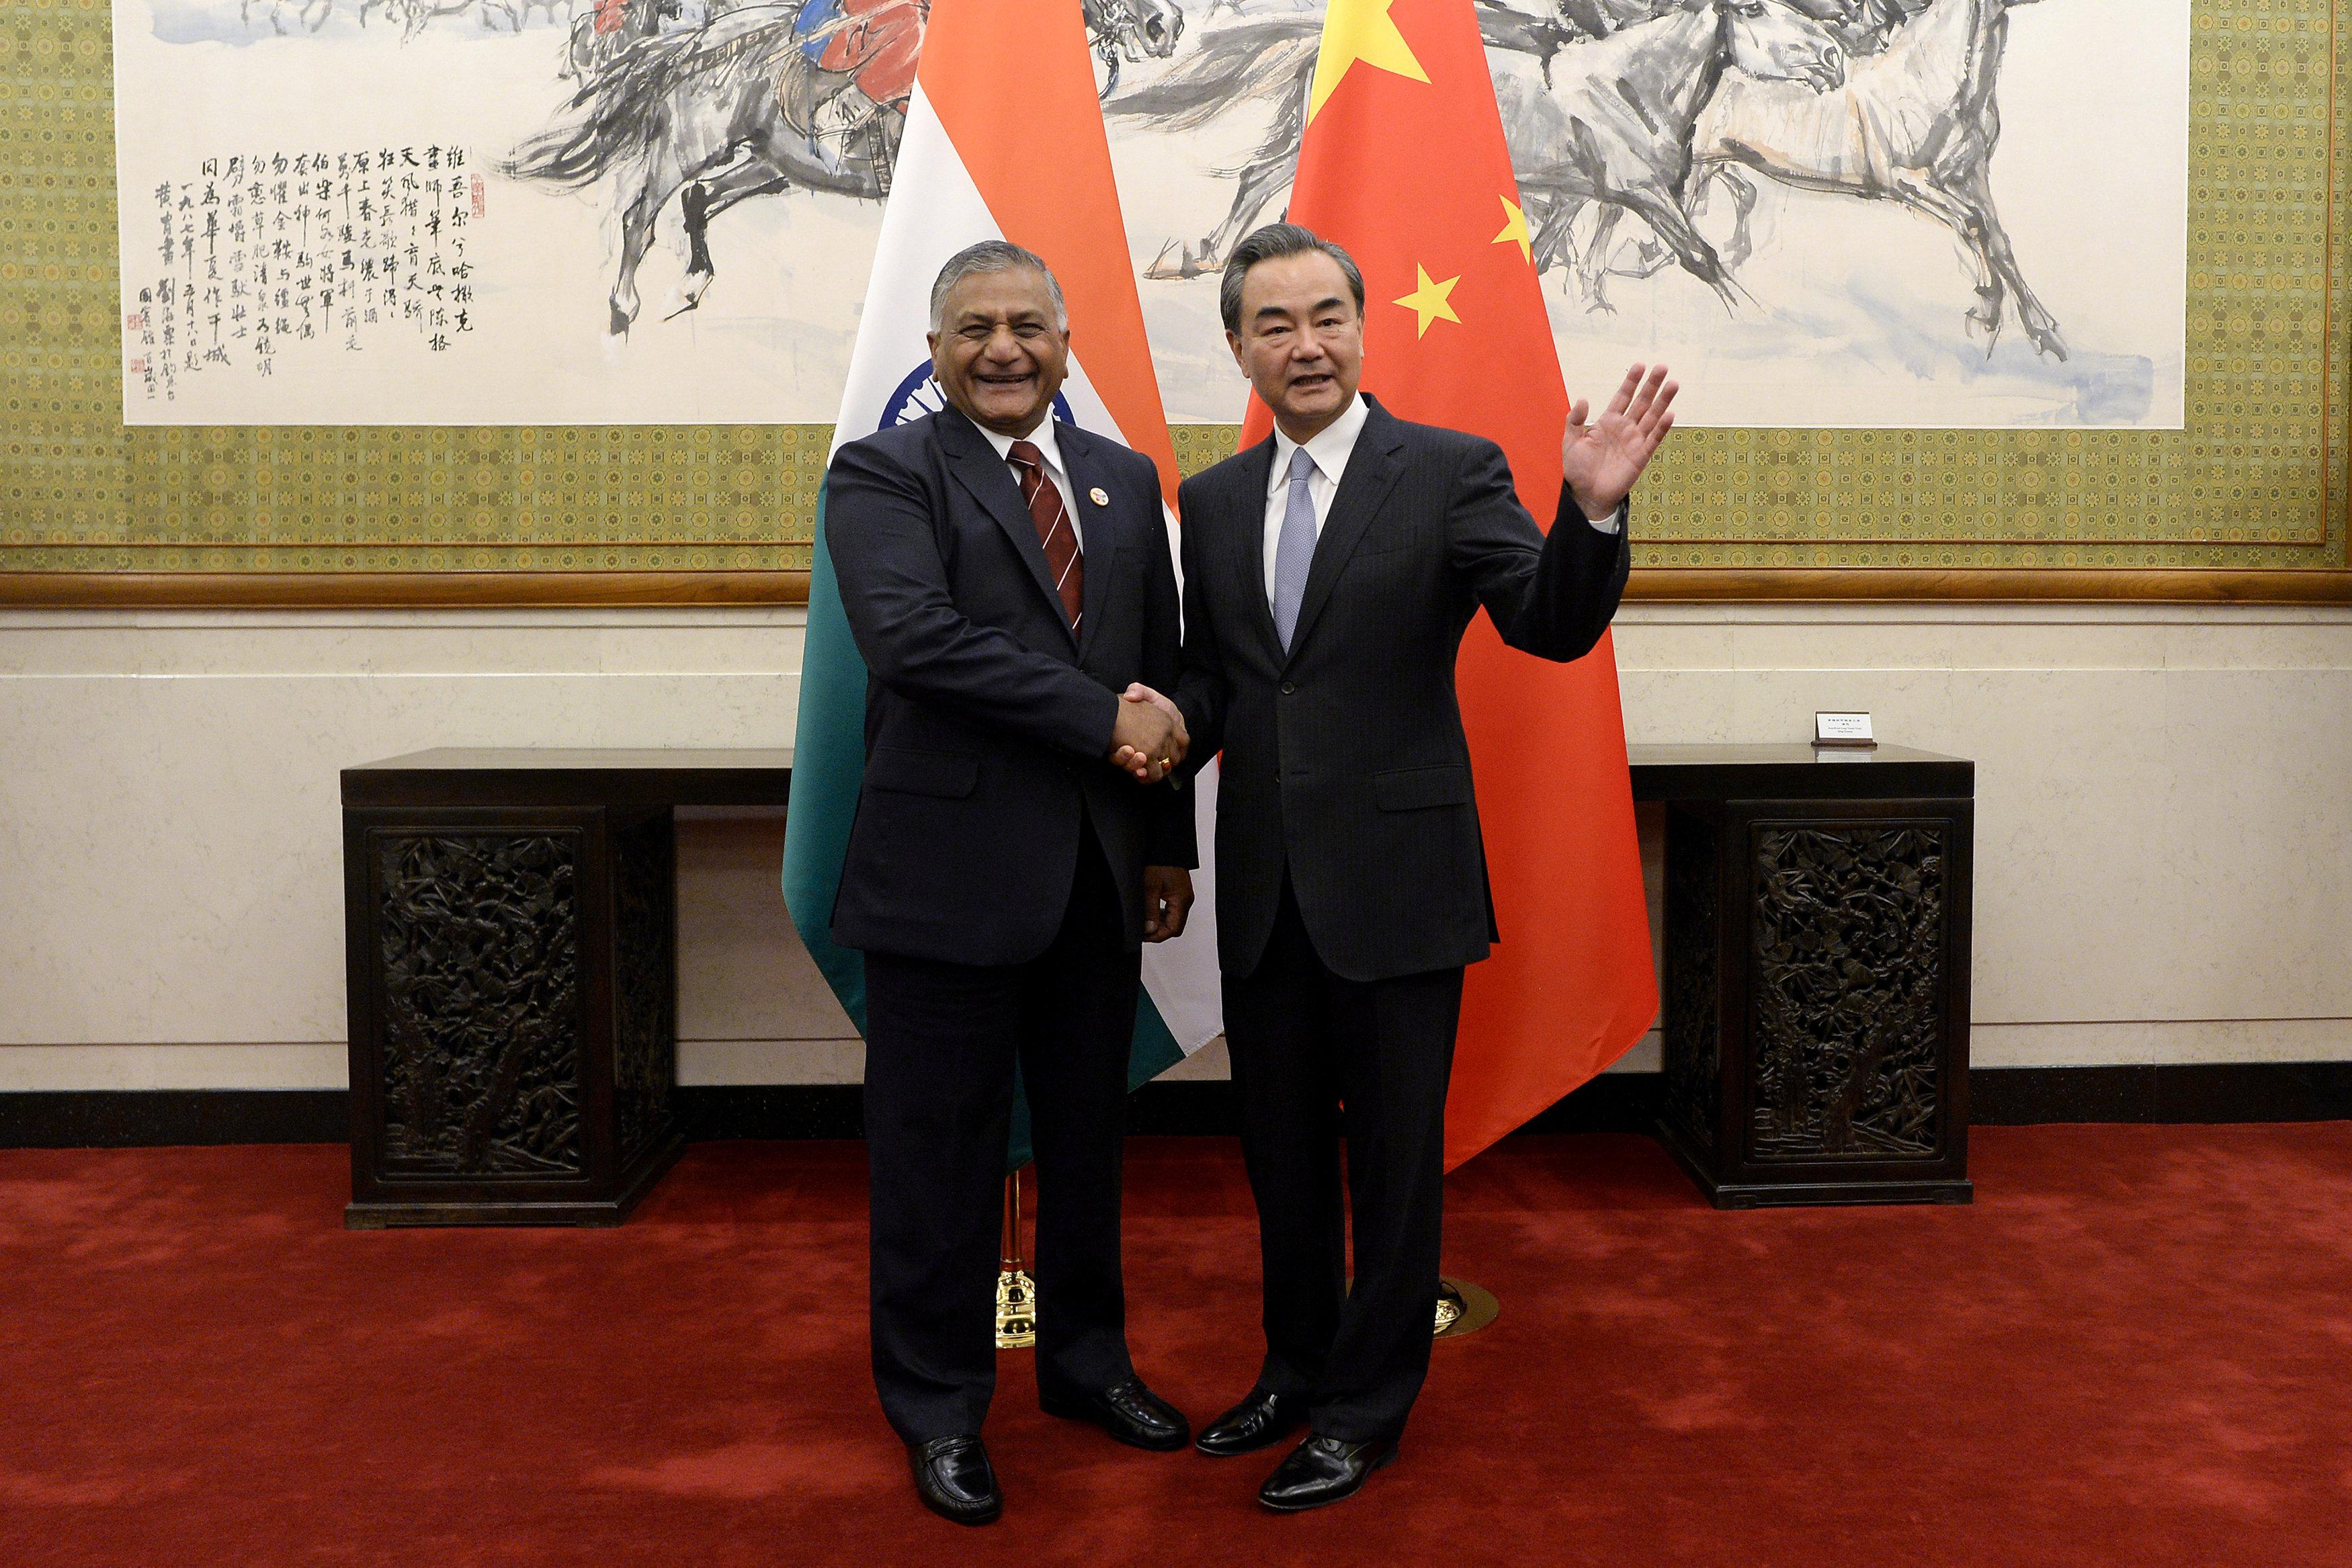 India, China hold talks for strengthening strategic partnership, mutual dialogue